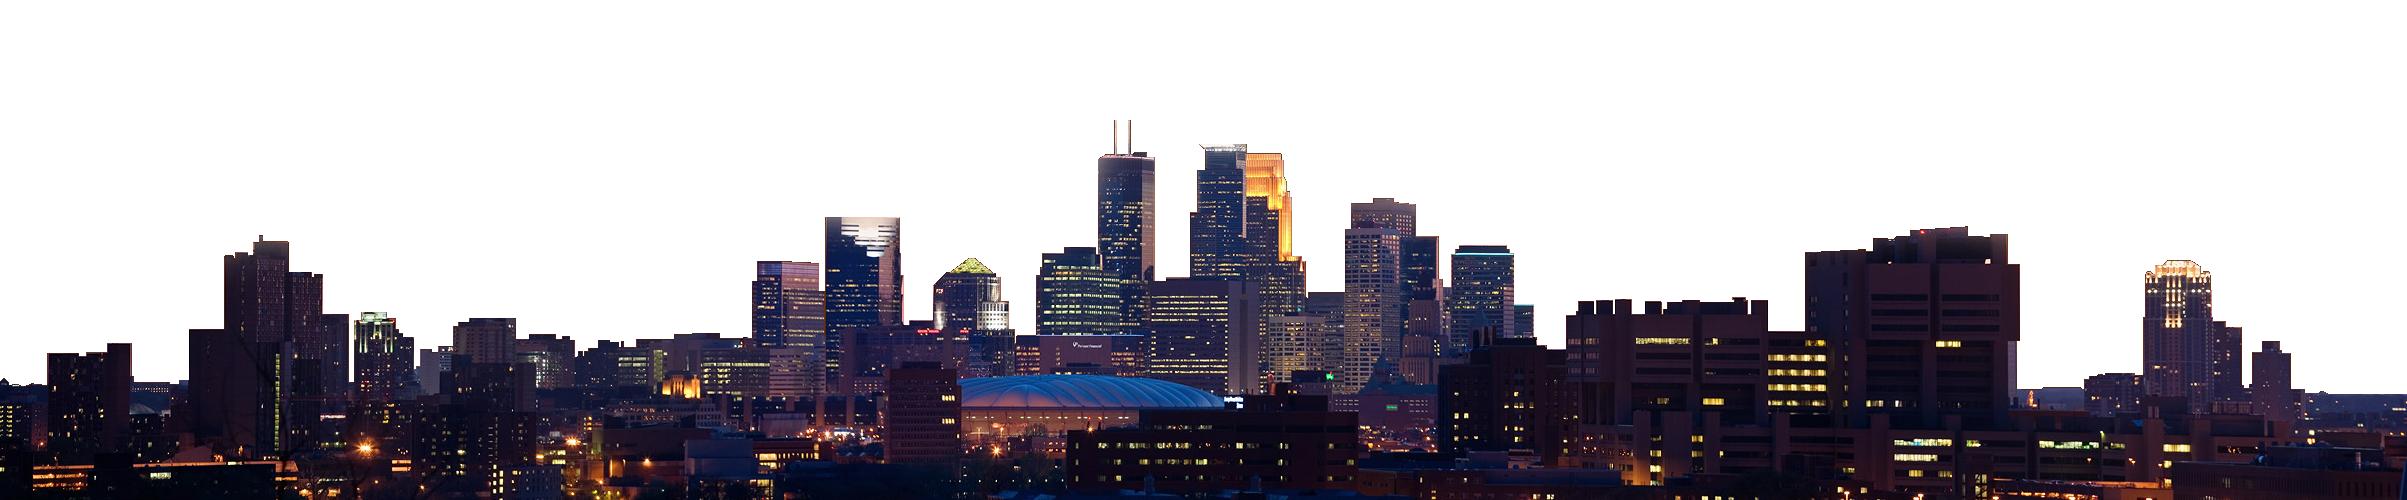 skyline clipart city wallpaper